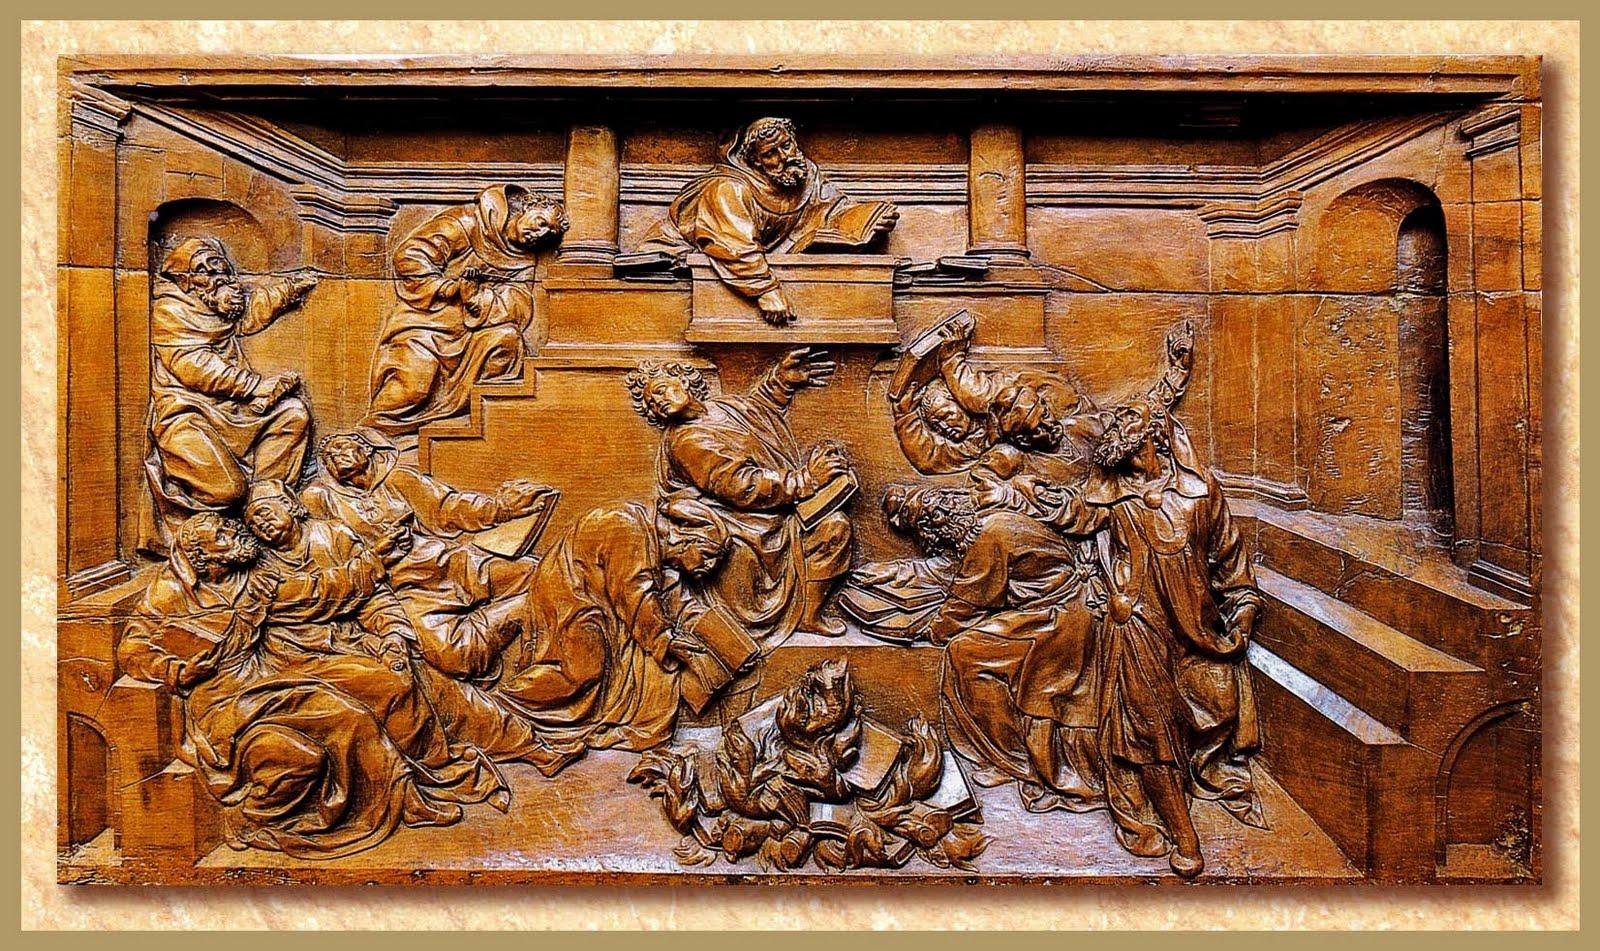 668-1-Juni-Juicio-a-monje-hereje-Museo-Leon-Travieso.jpg